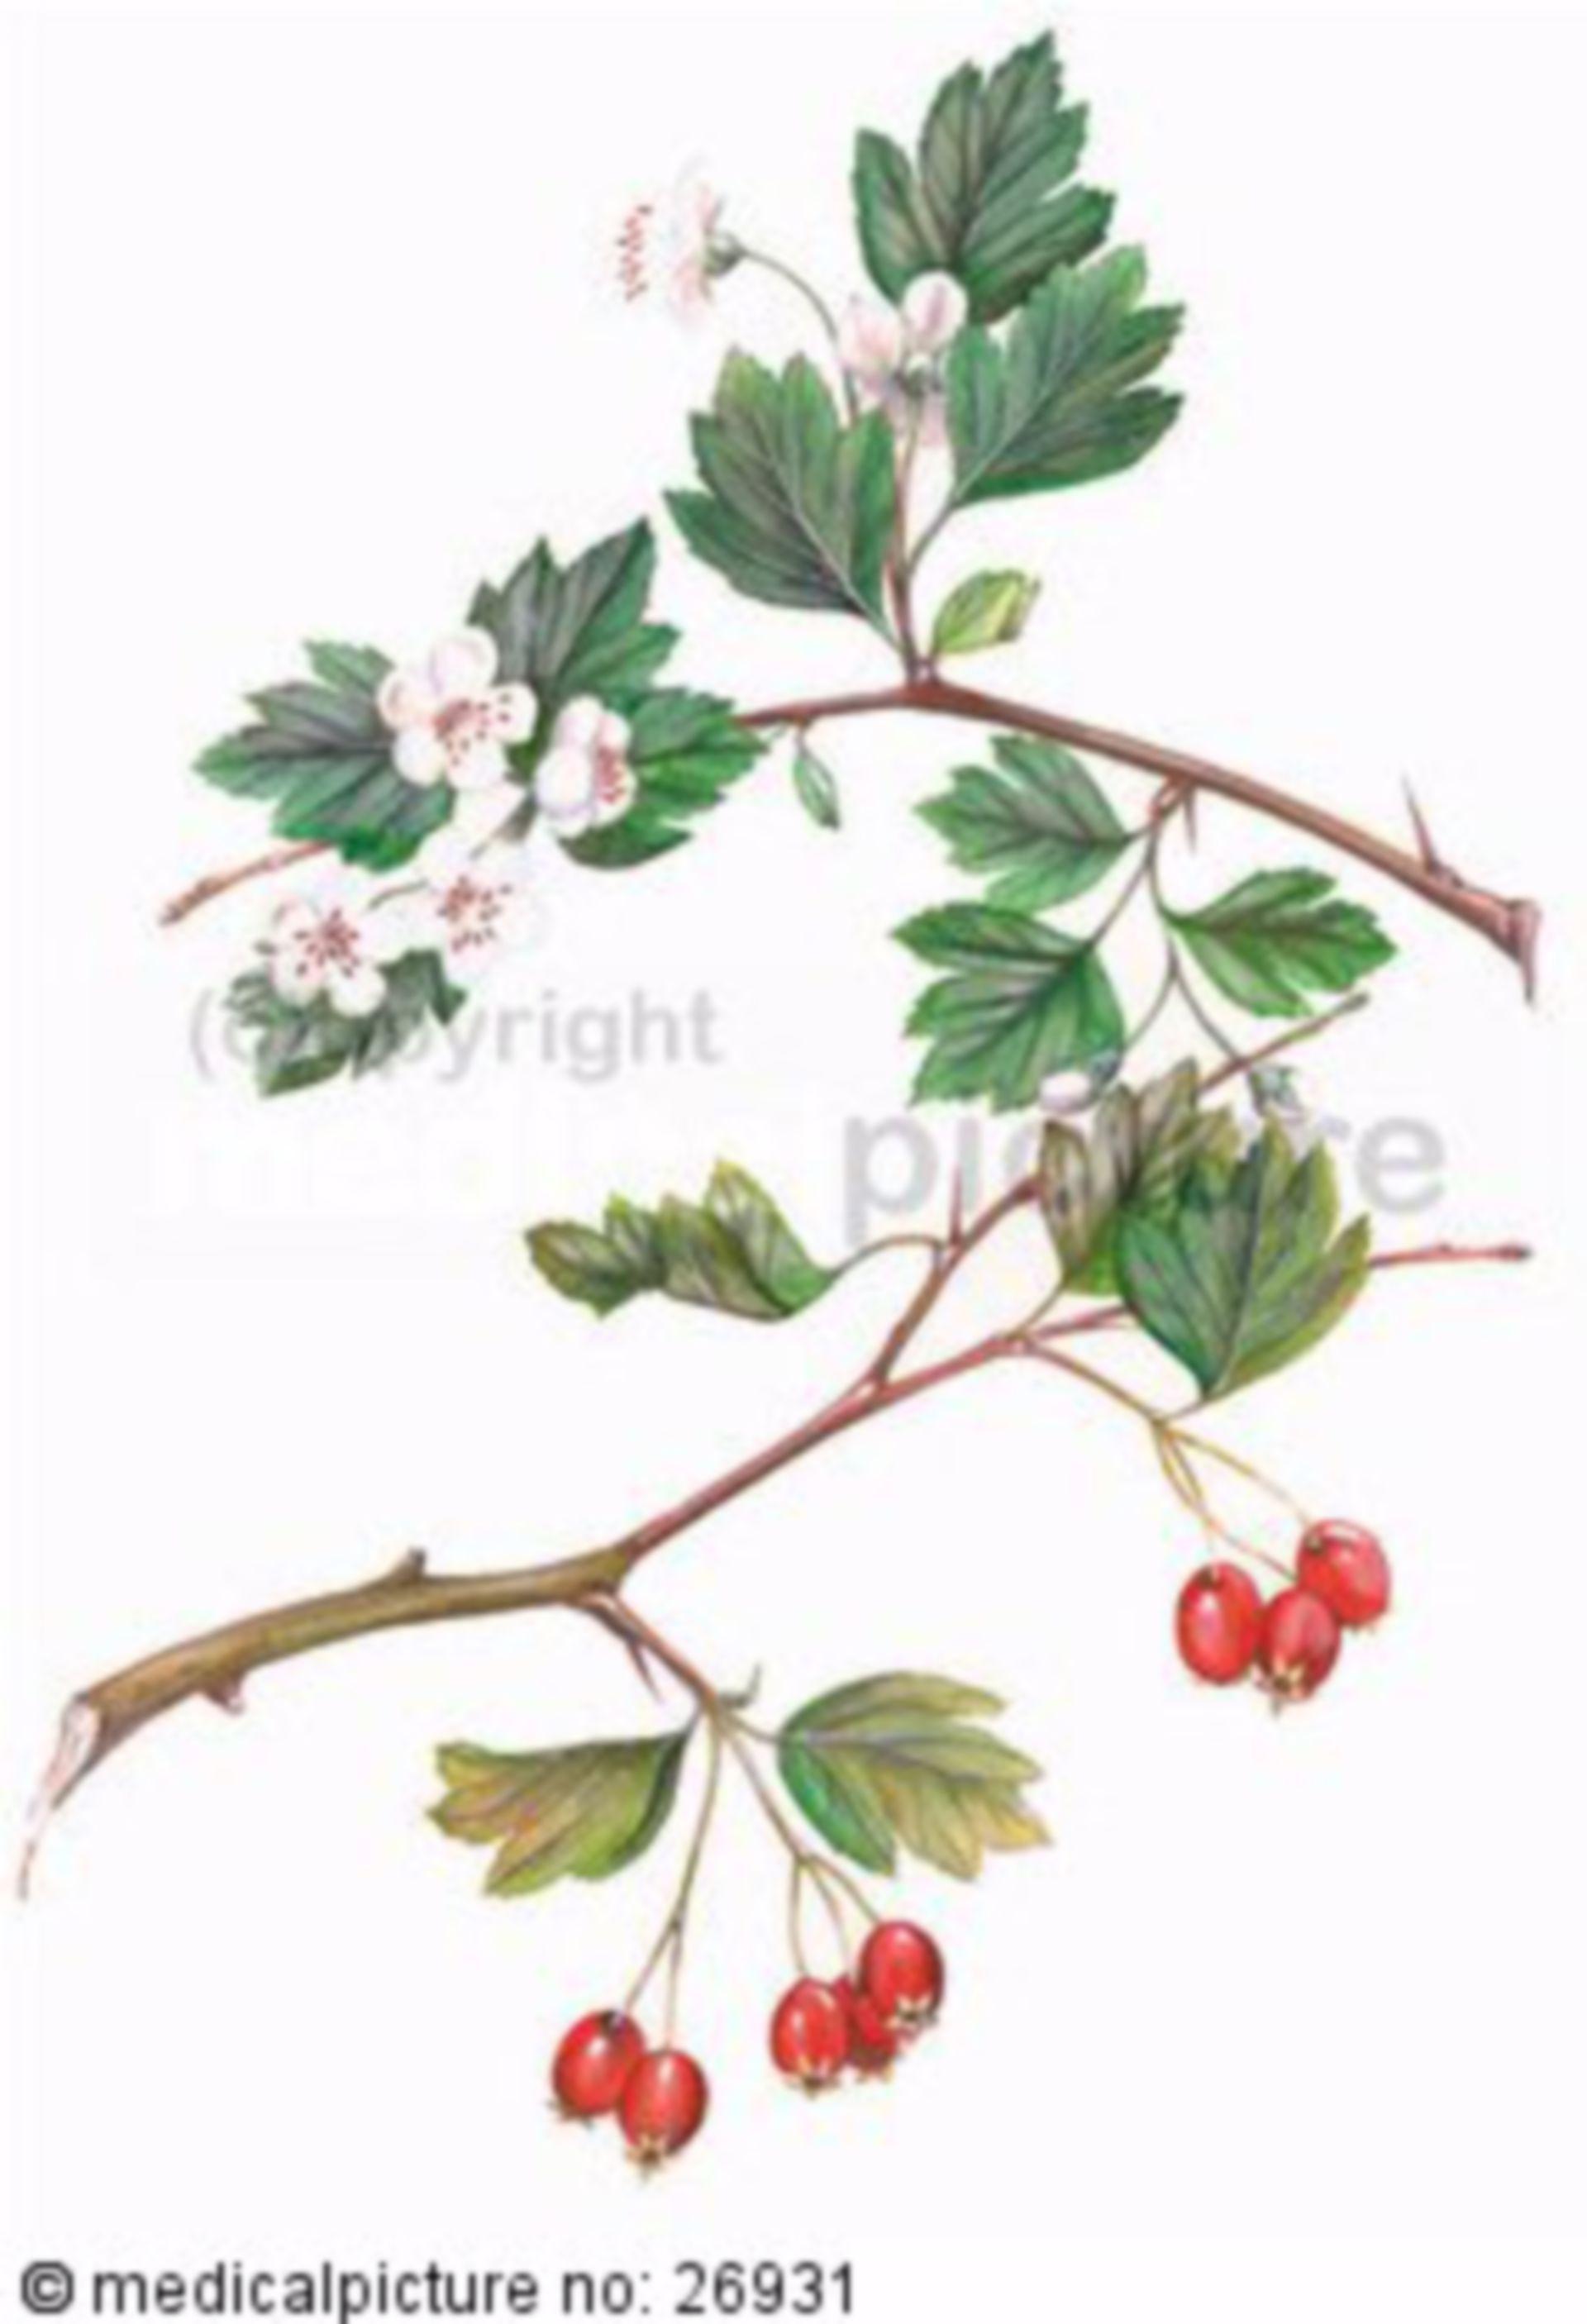 Strauch, Crataegus oxyacantha , Weissdorn